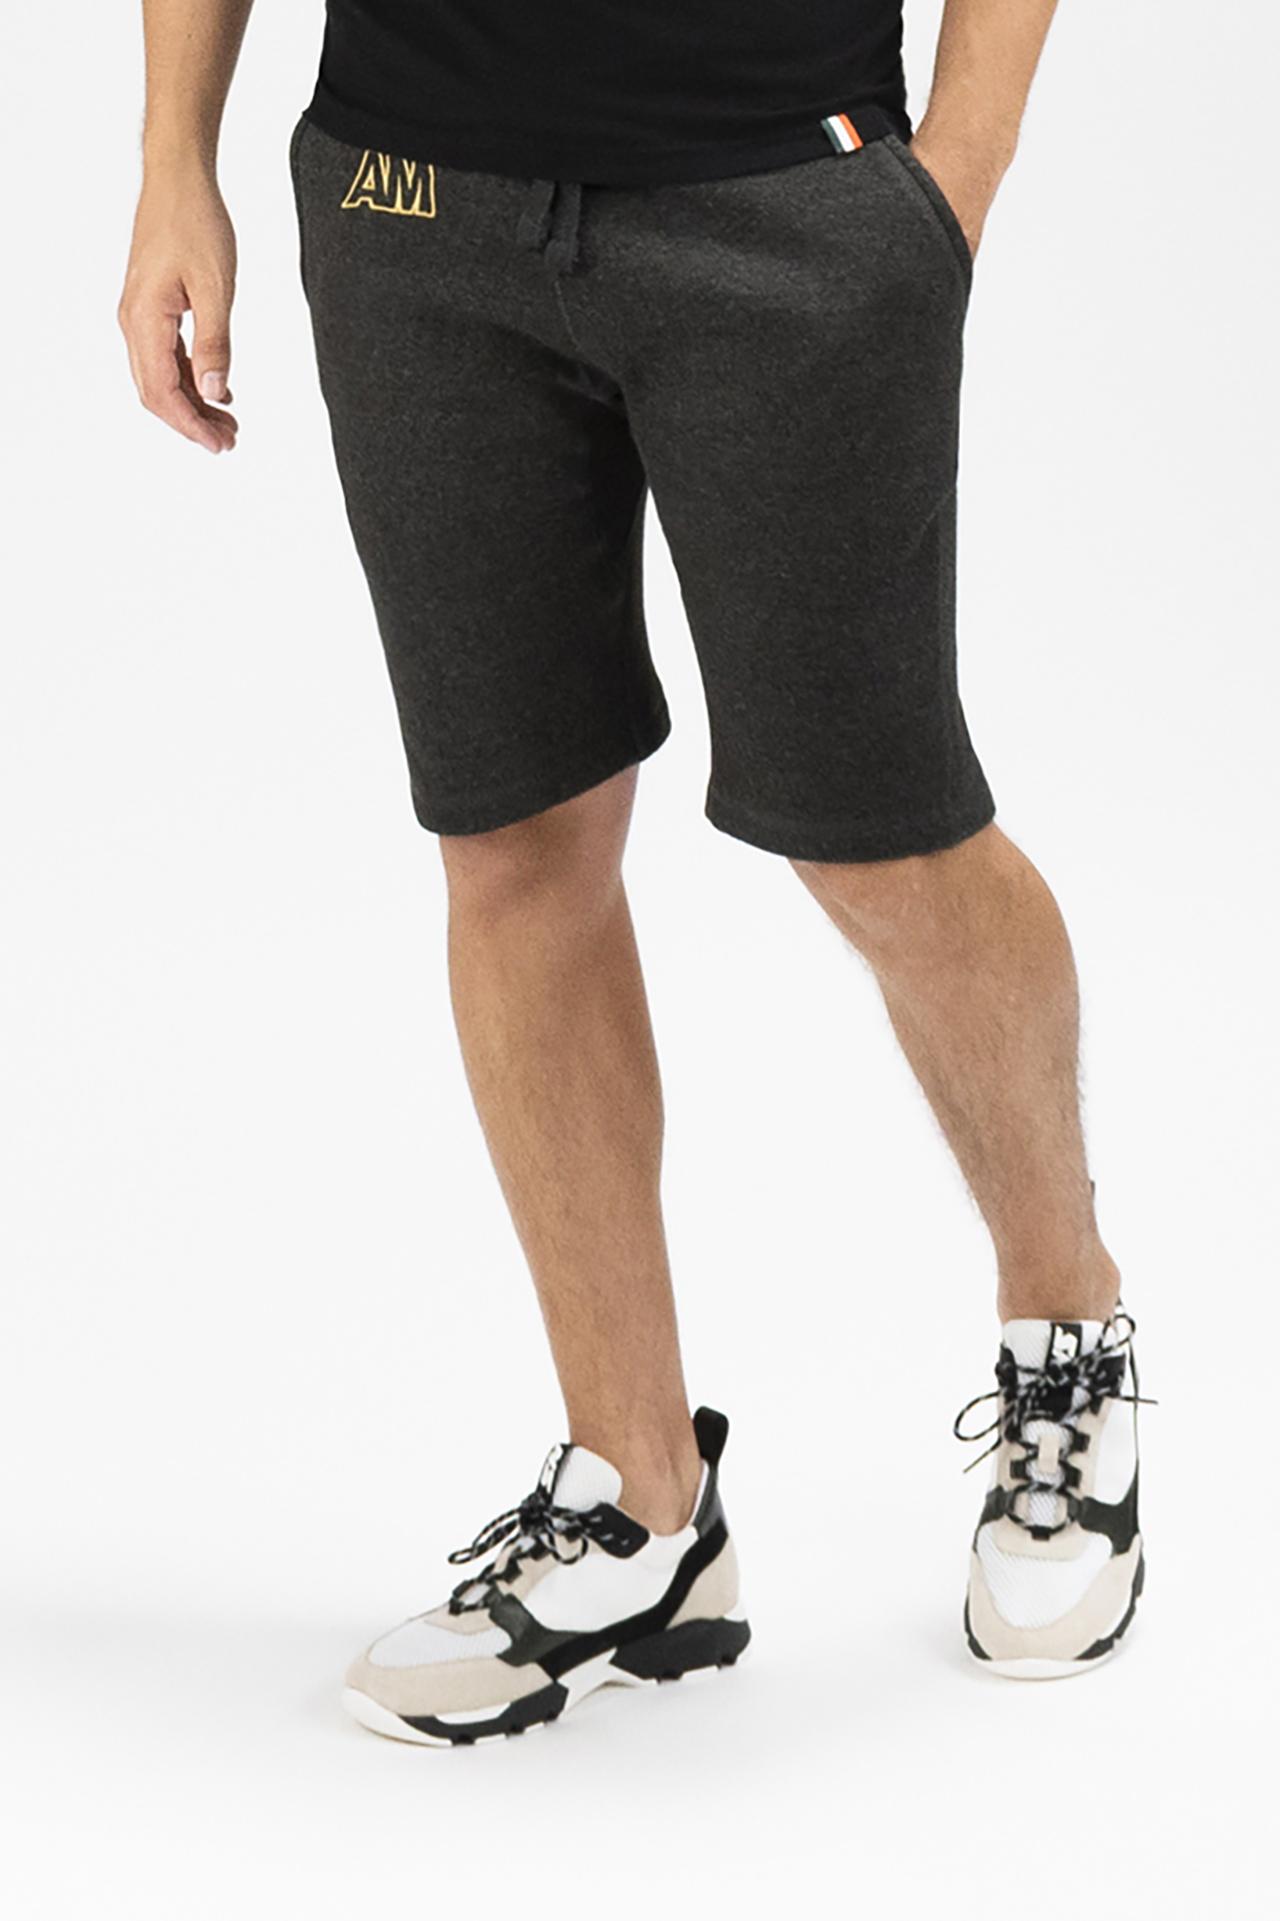 AM Sweatshorts in Charcoal Grey